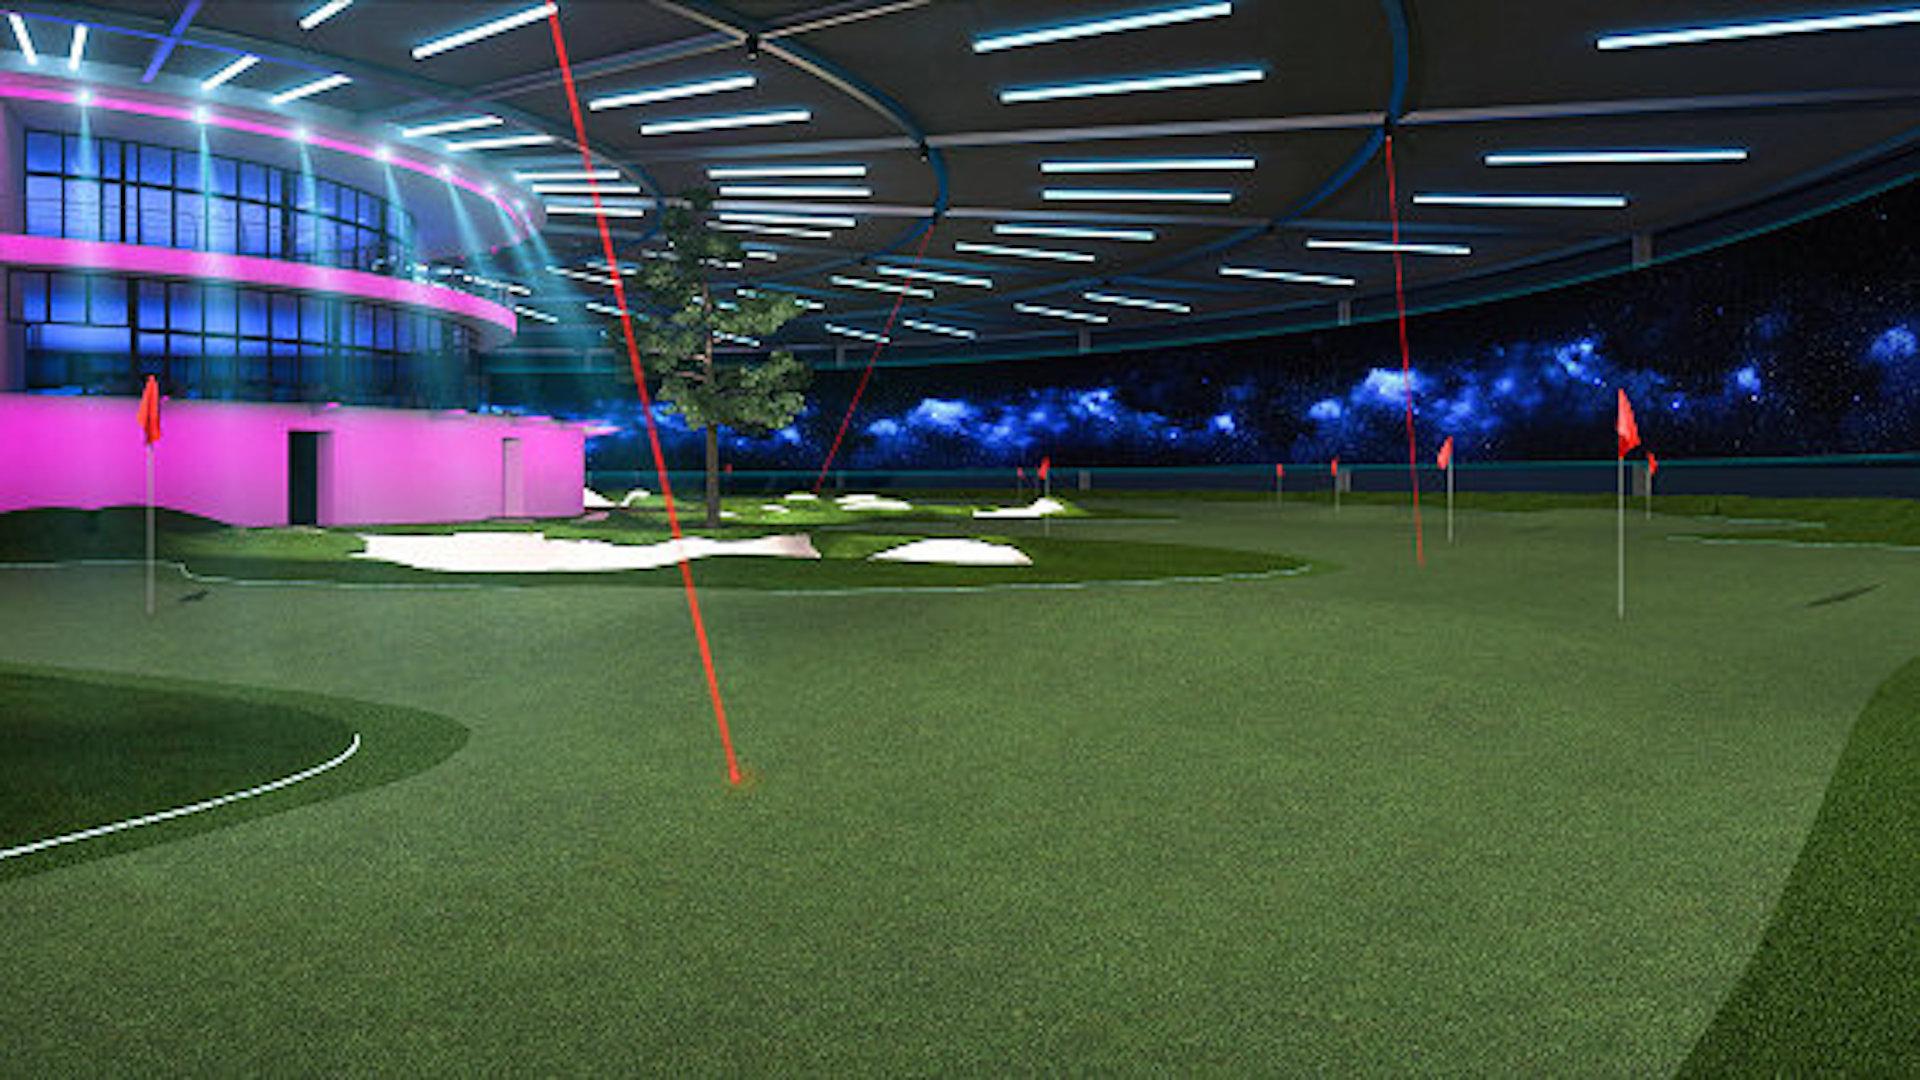 83c7289c6c REALiTEE Golf releases stunning night view - GolfPunkHQ